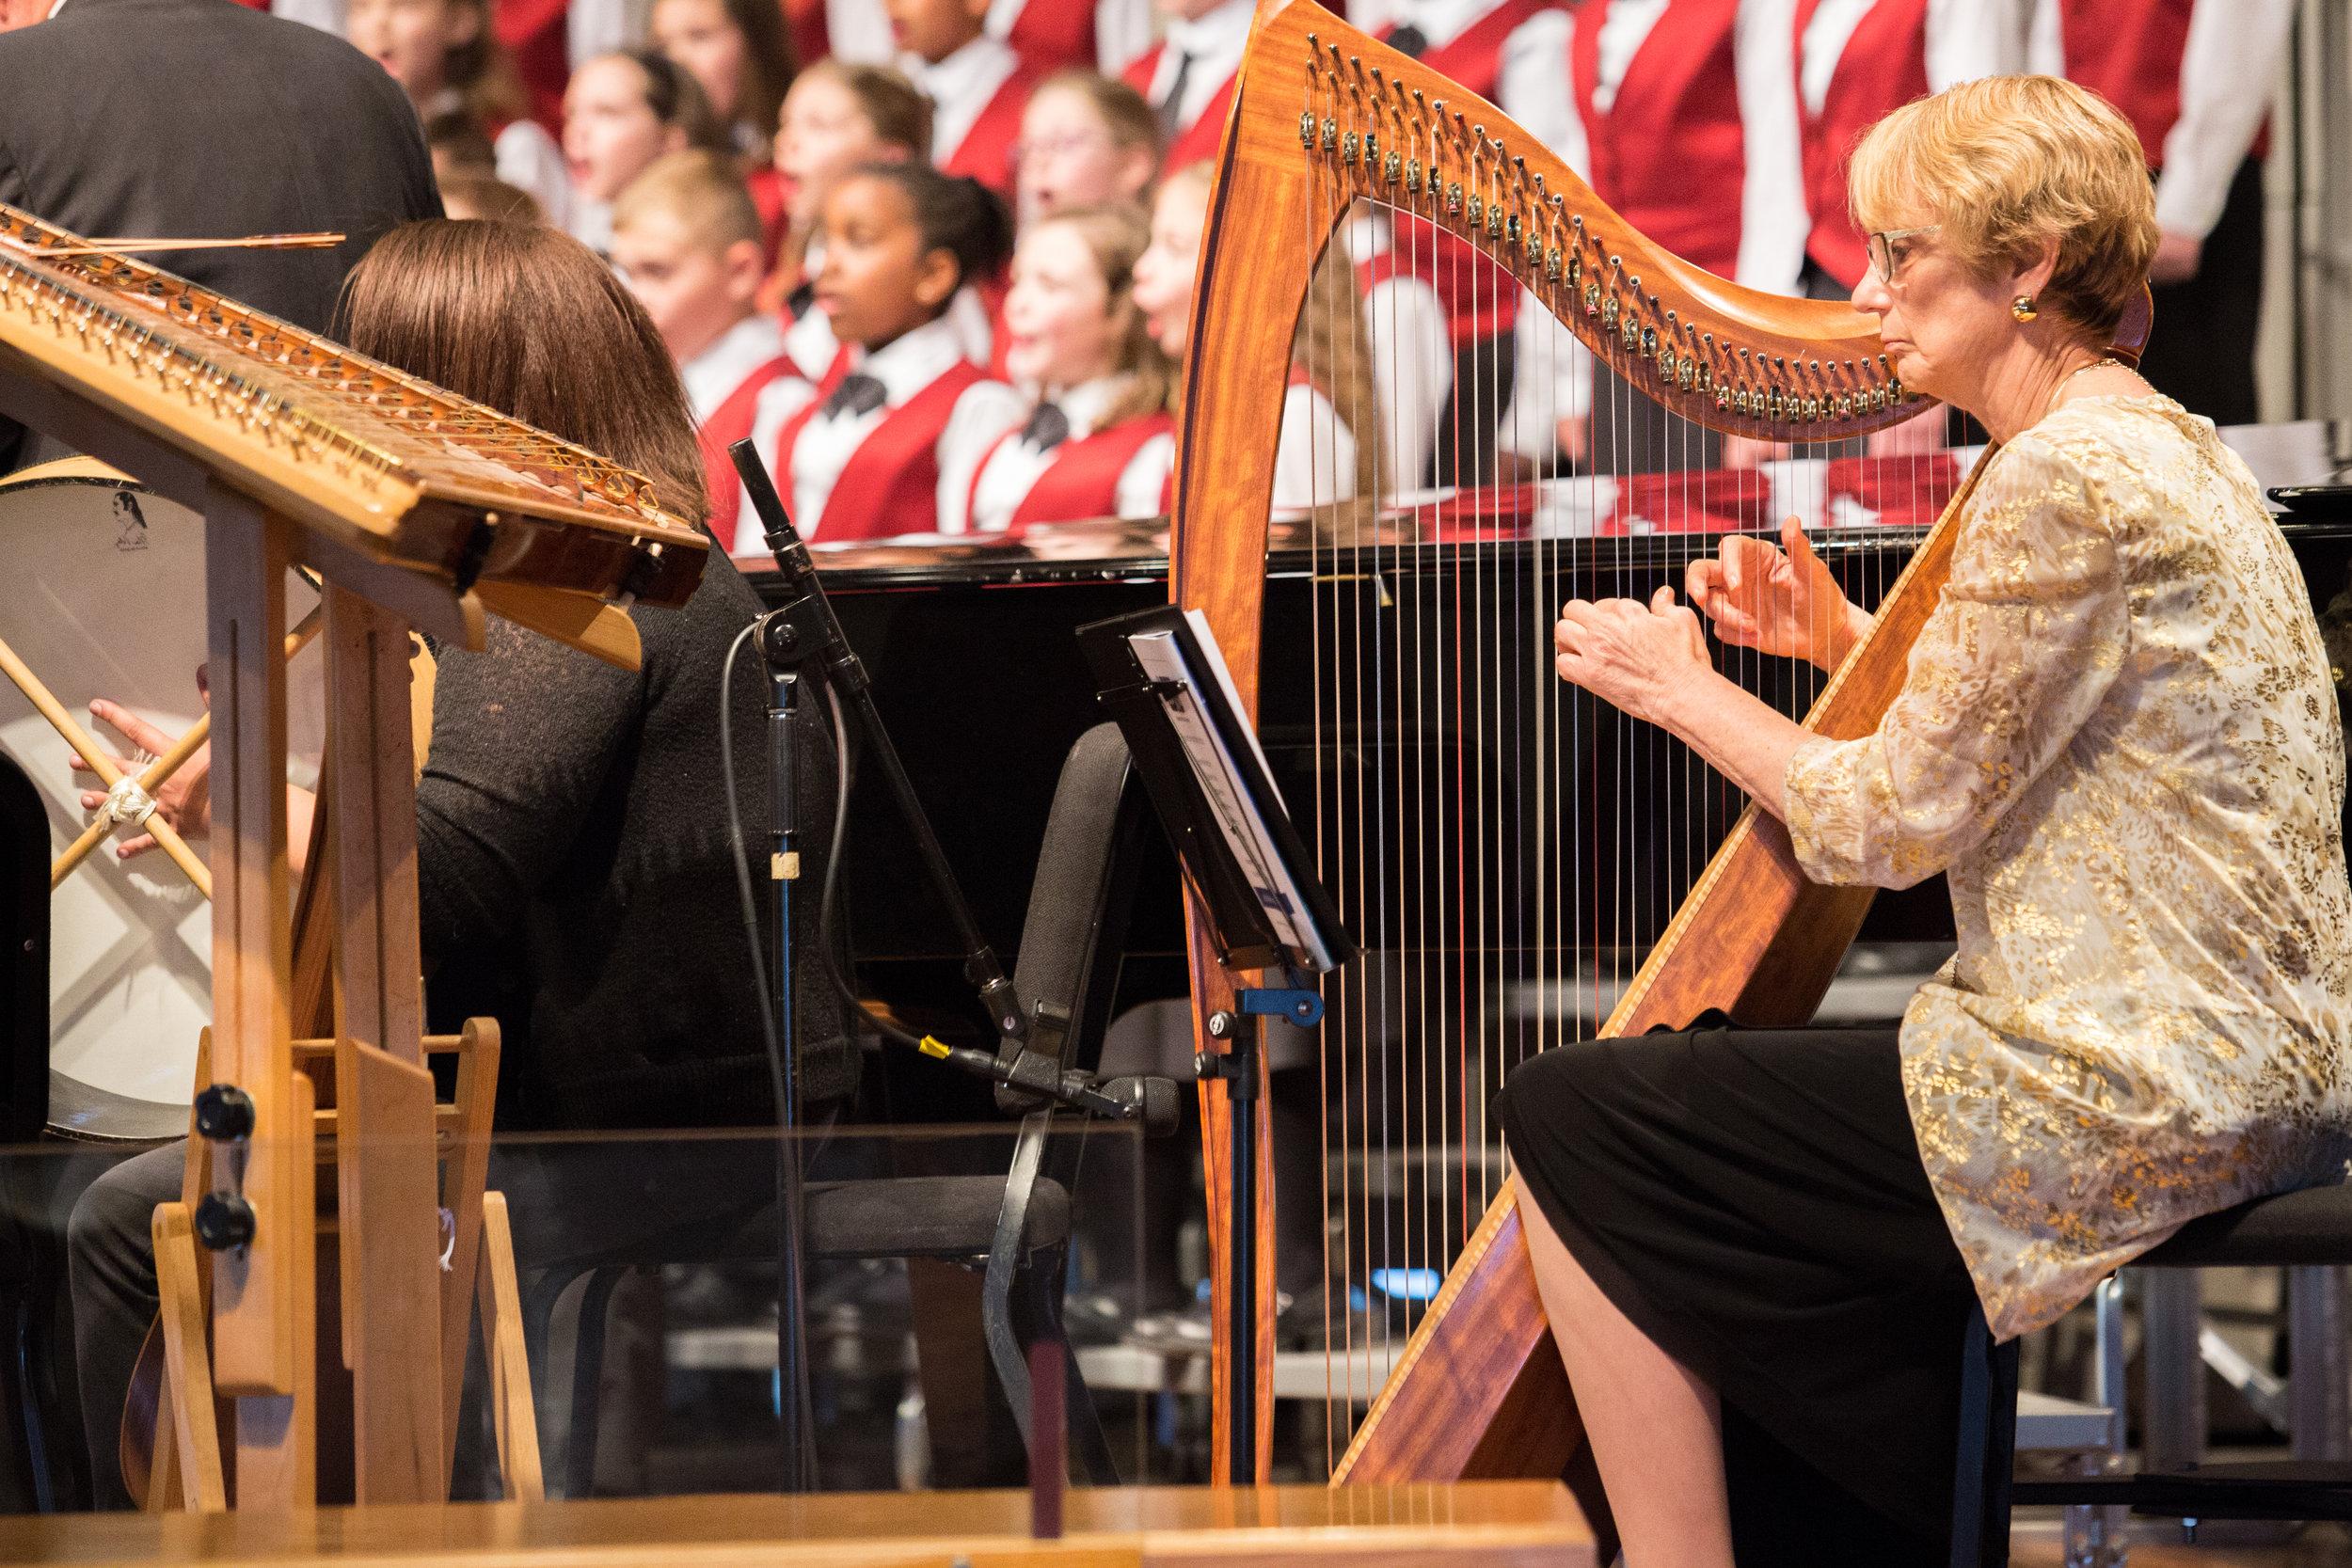 20160410-SVCC Concert with Ann Robinson-harp-025.jpg